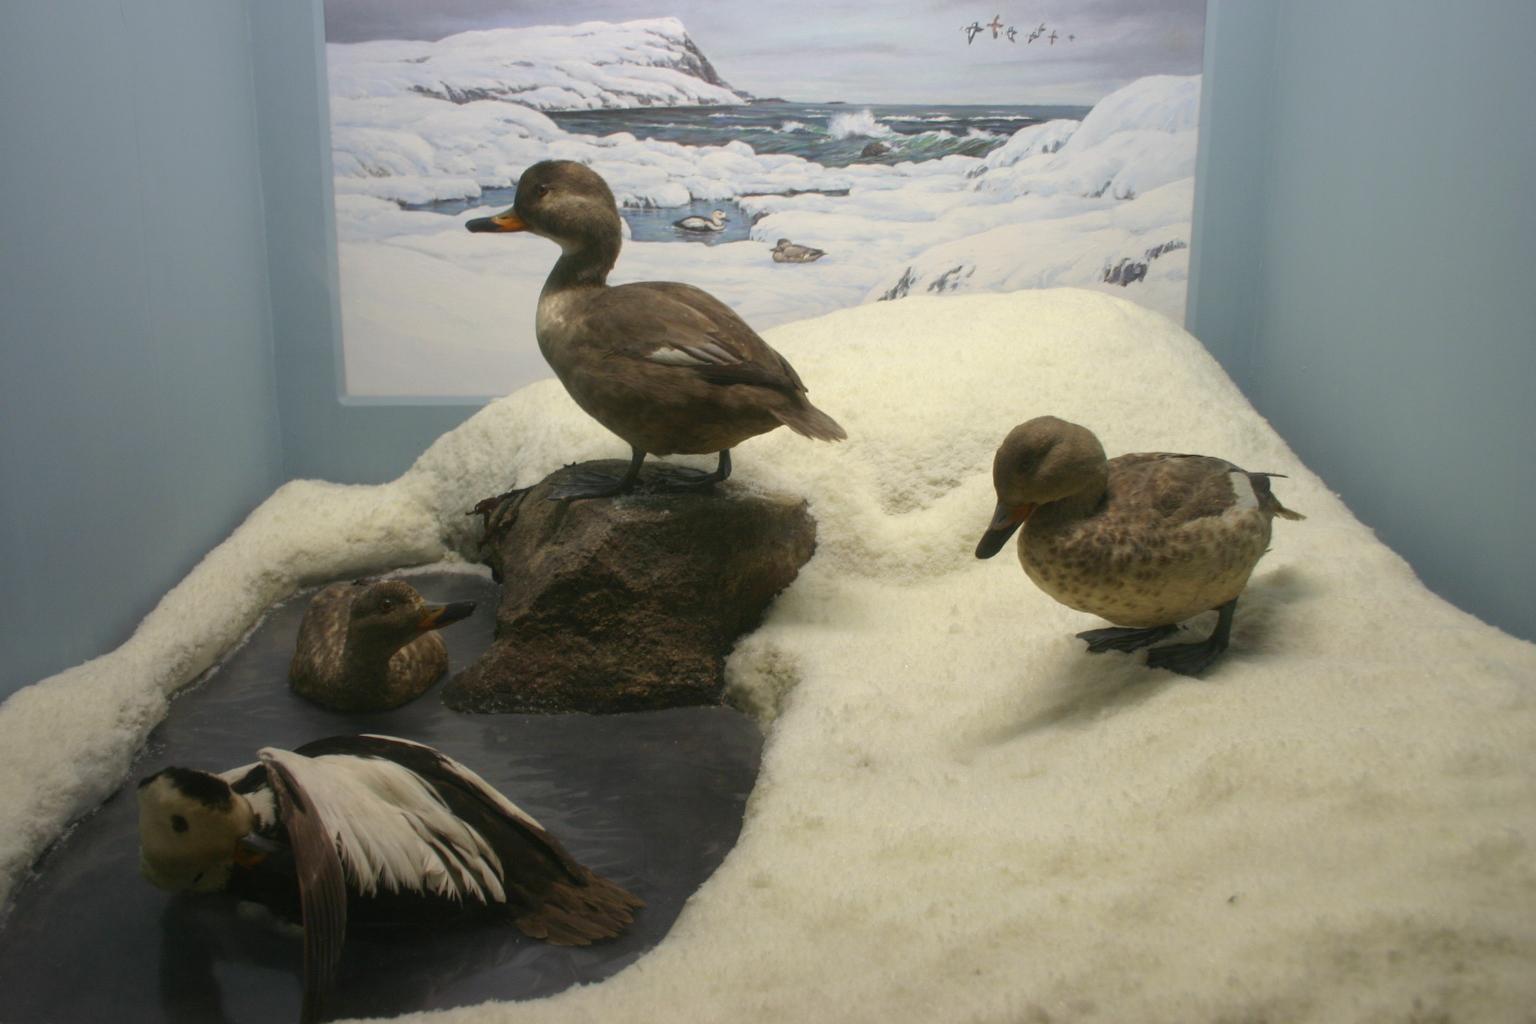 Labrador Ducks AMNH.jpg